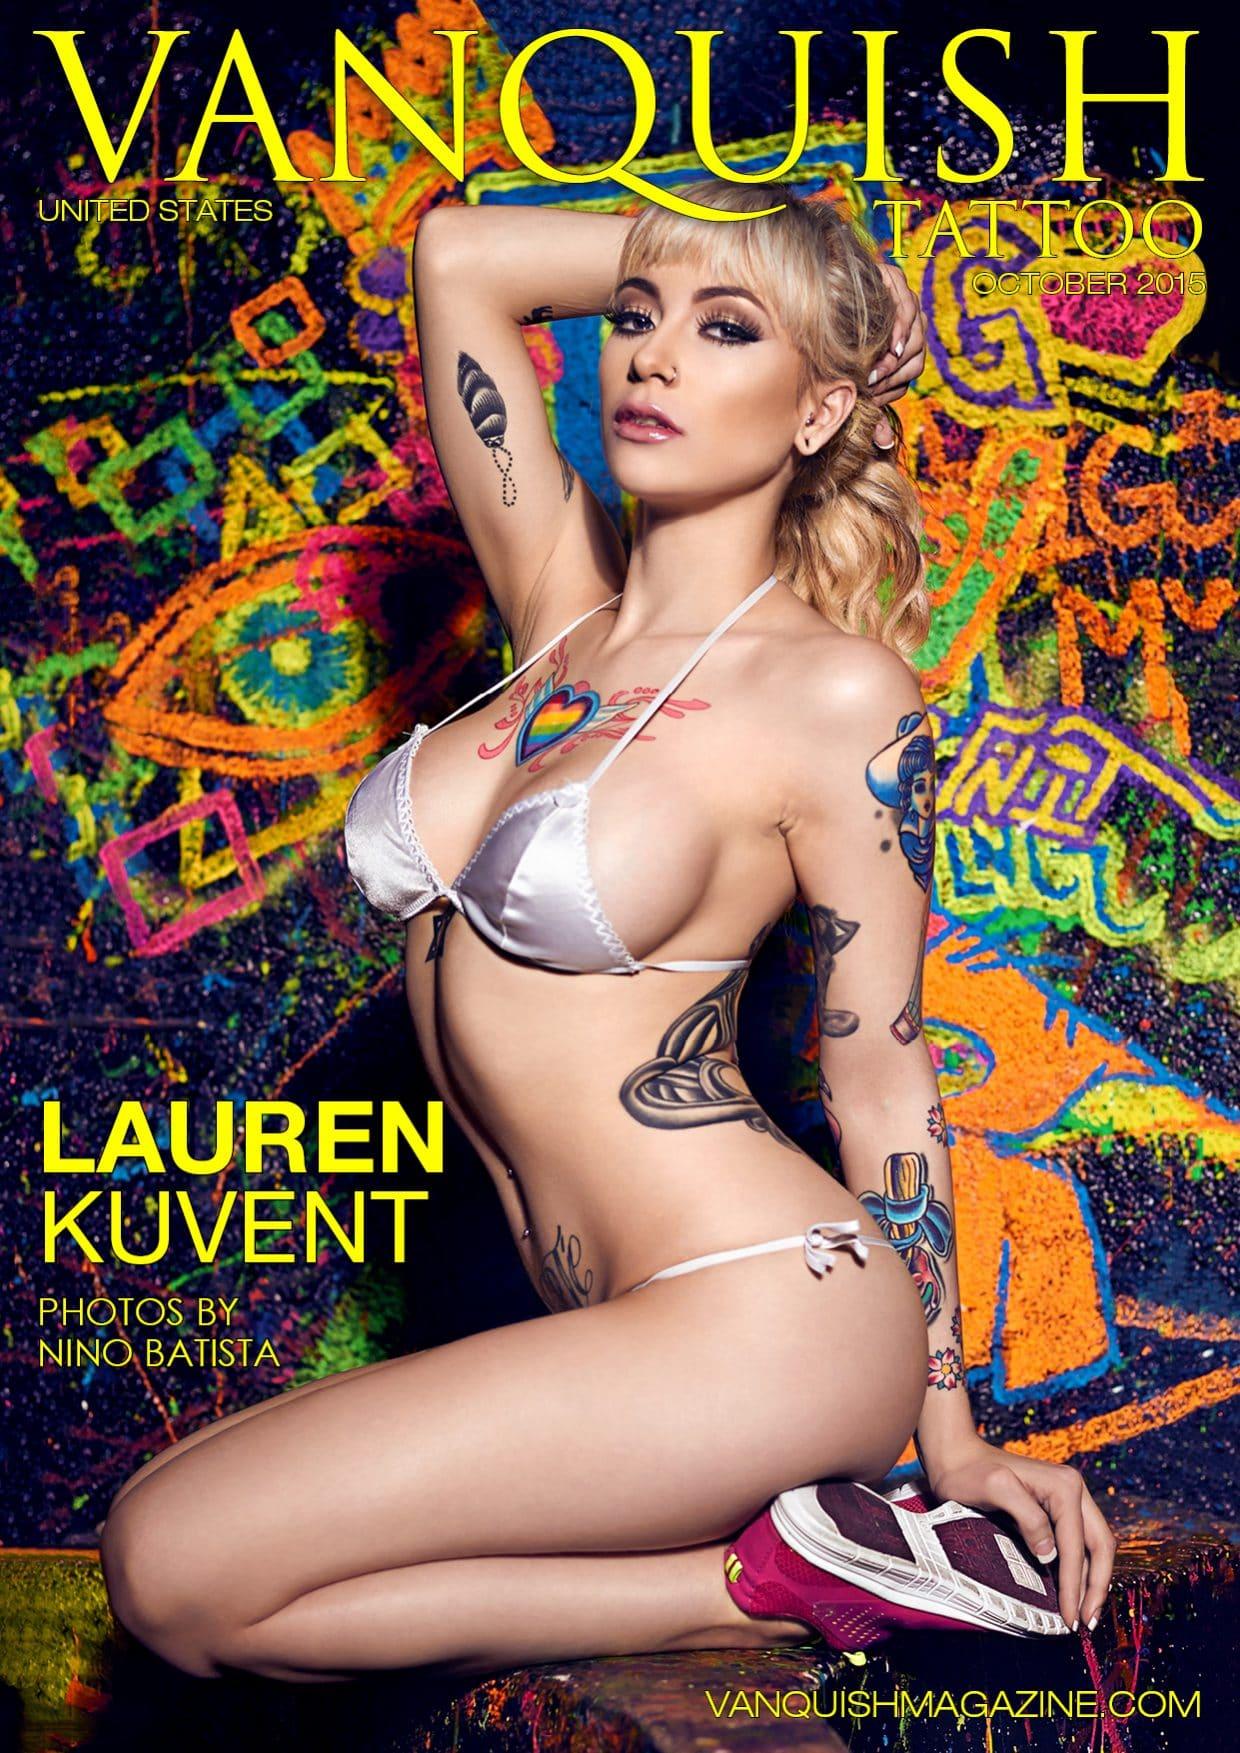 Vanquish Tattoo Magazine - October 2015 - Lauren Kuvent 1